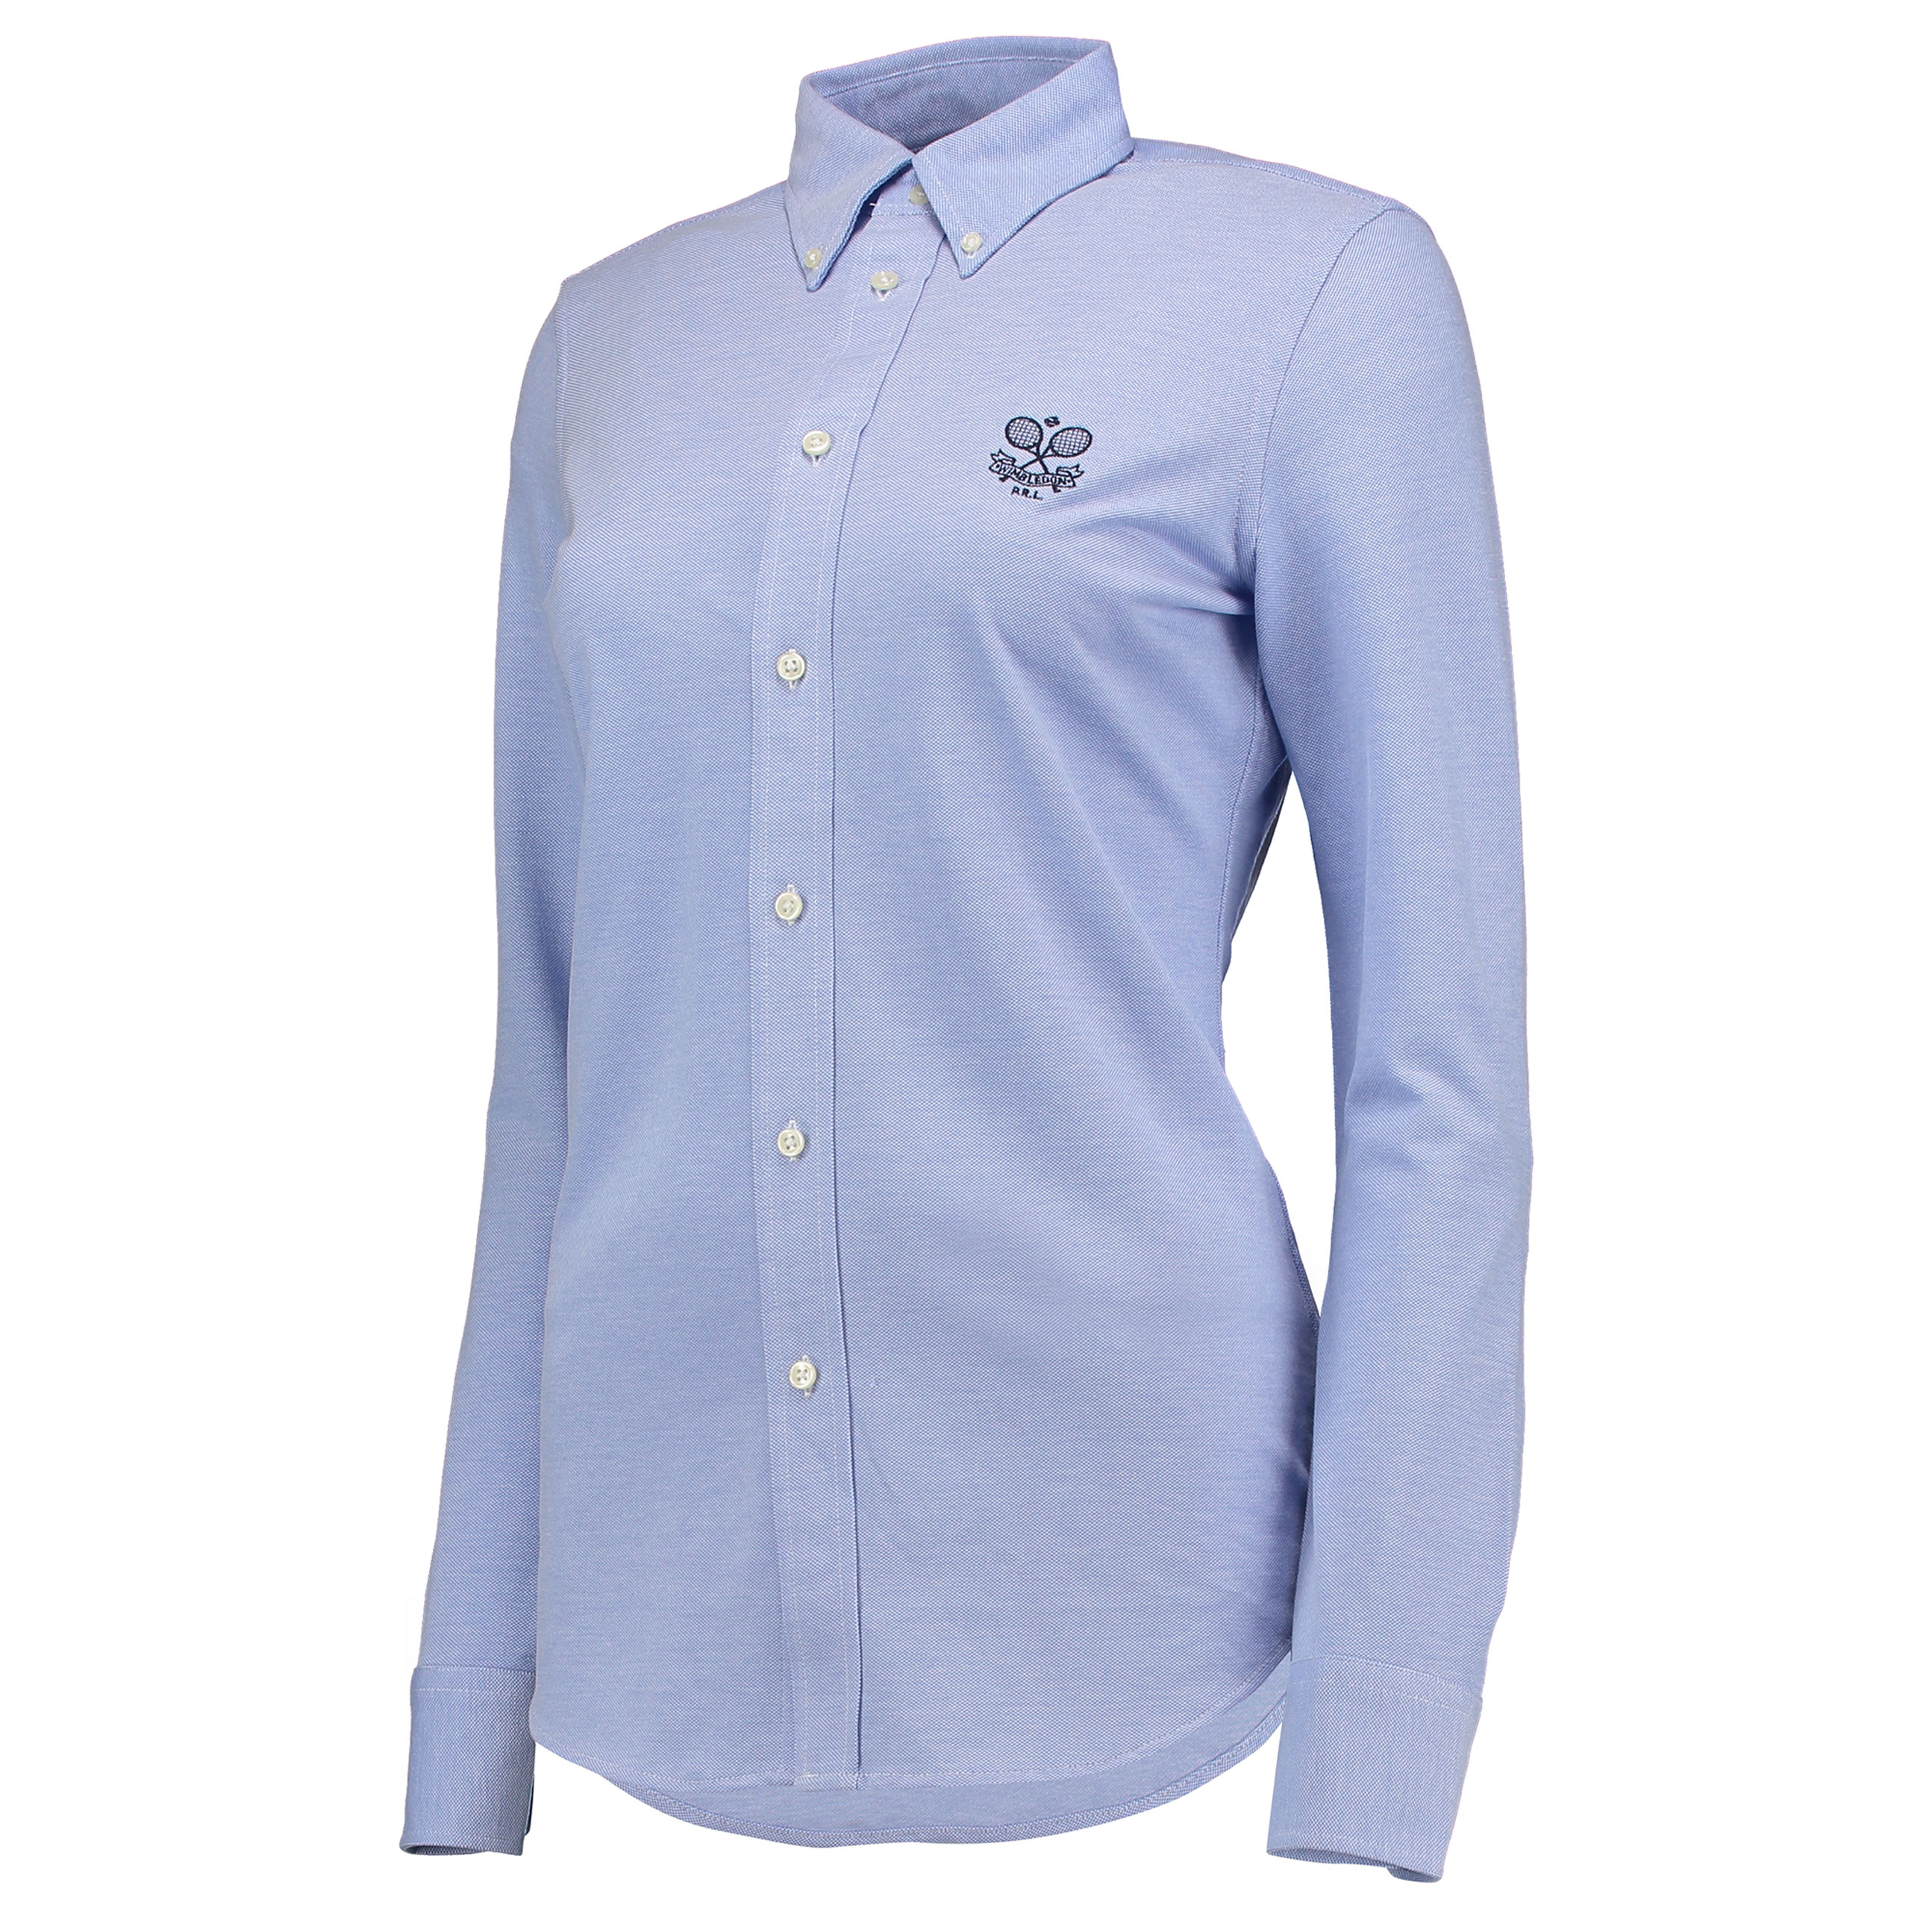 Wimbledon Ralph Lauren Oxford Shirt - Harbor Island - Ladies